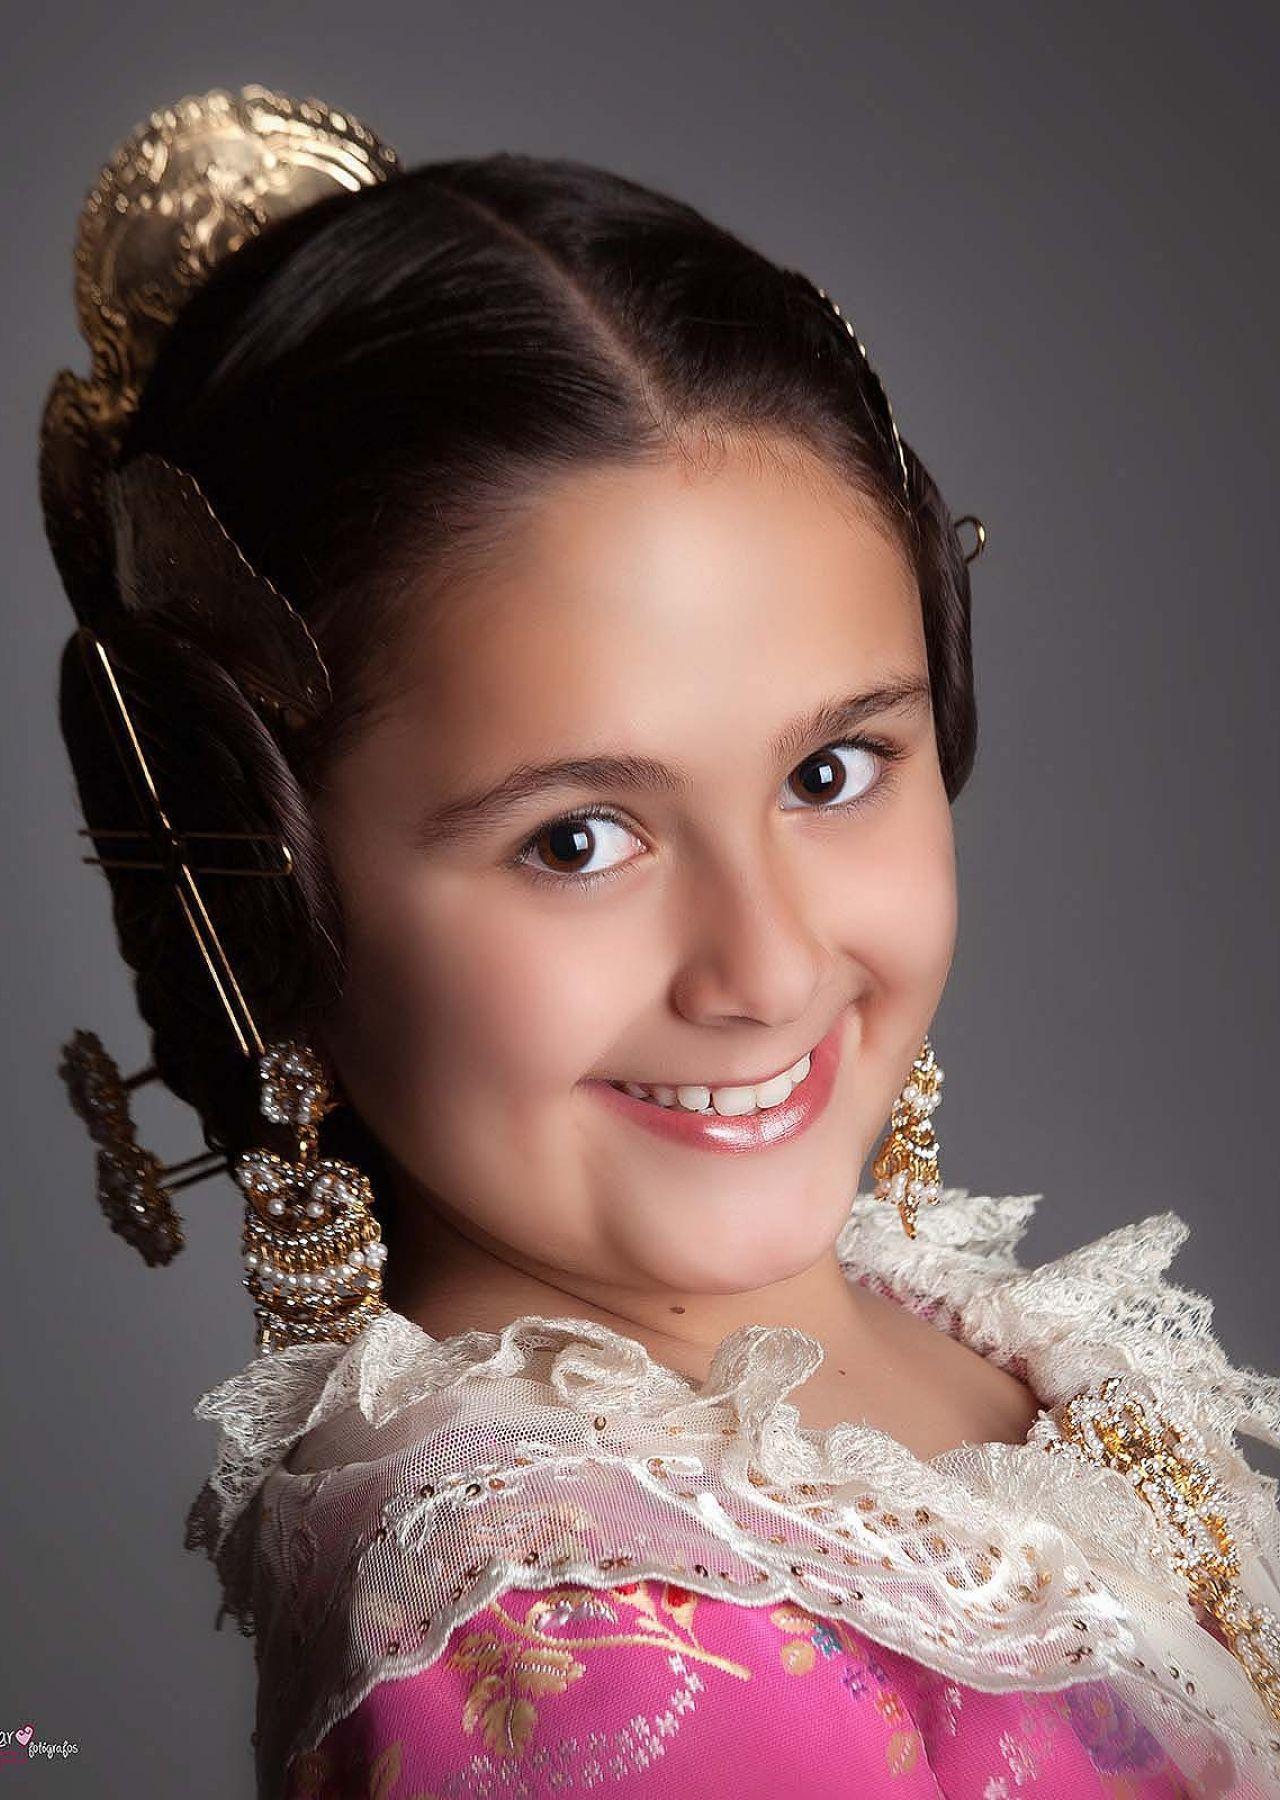 Marta Barberá Menoyo